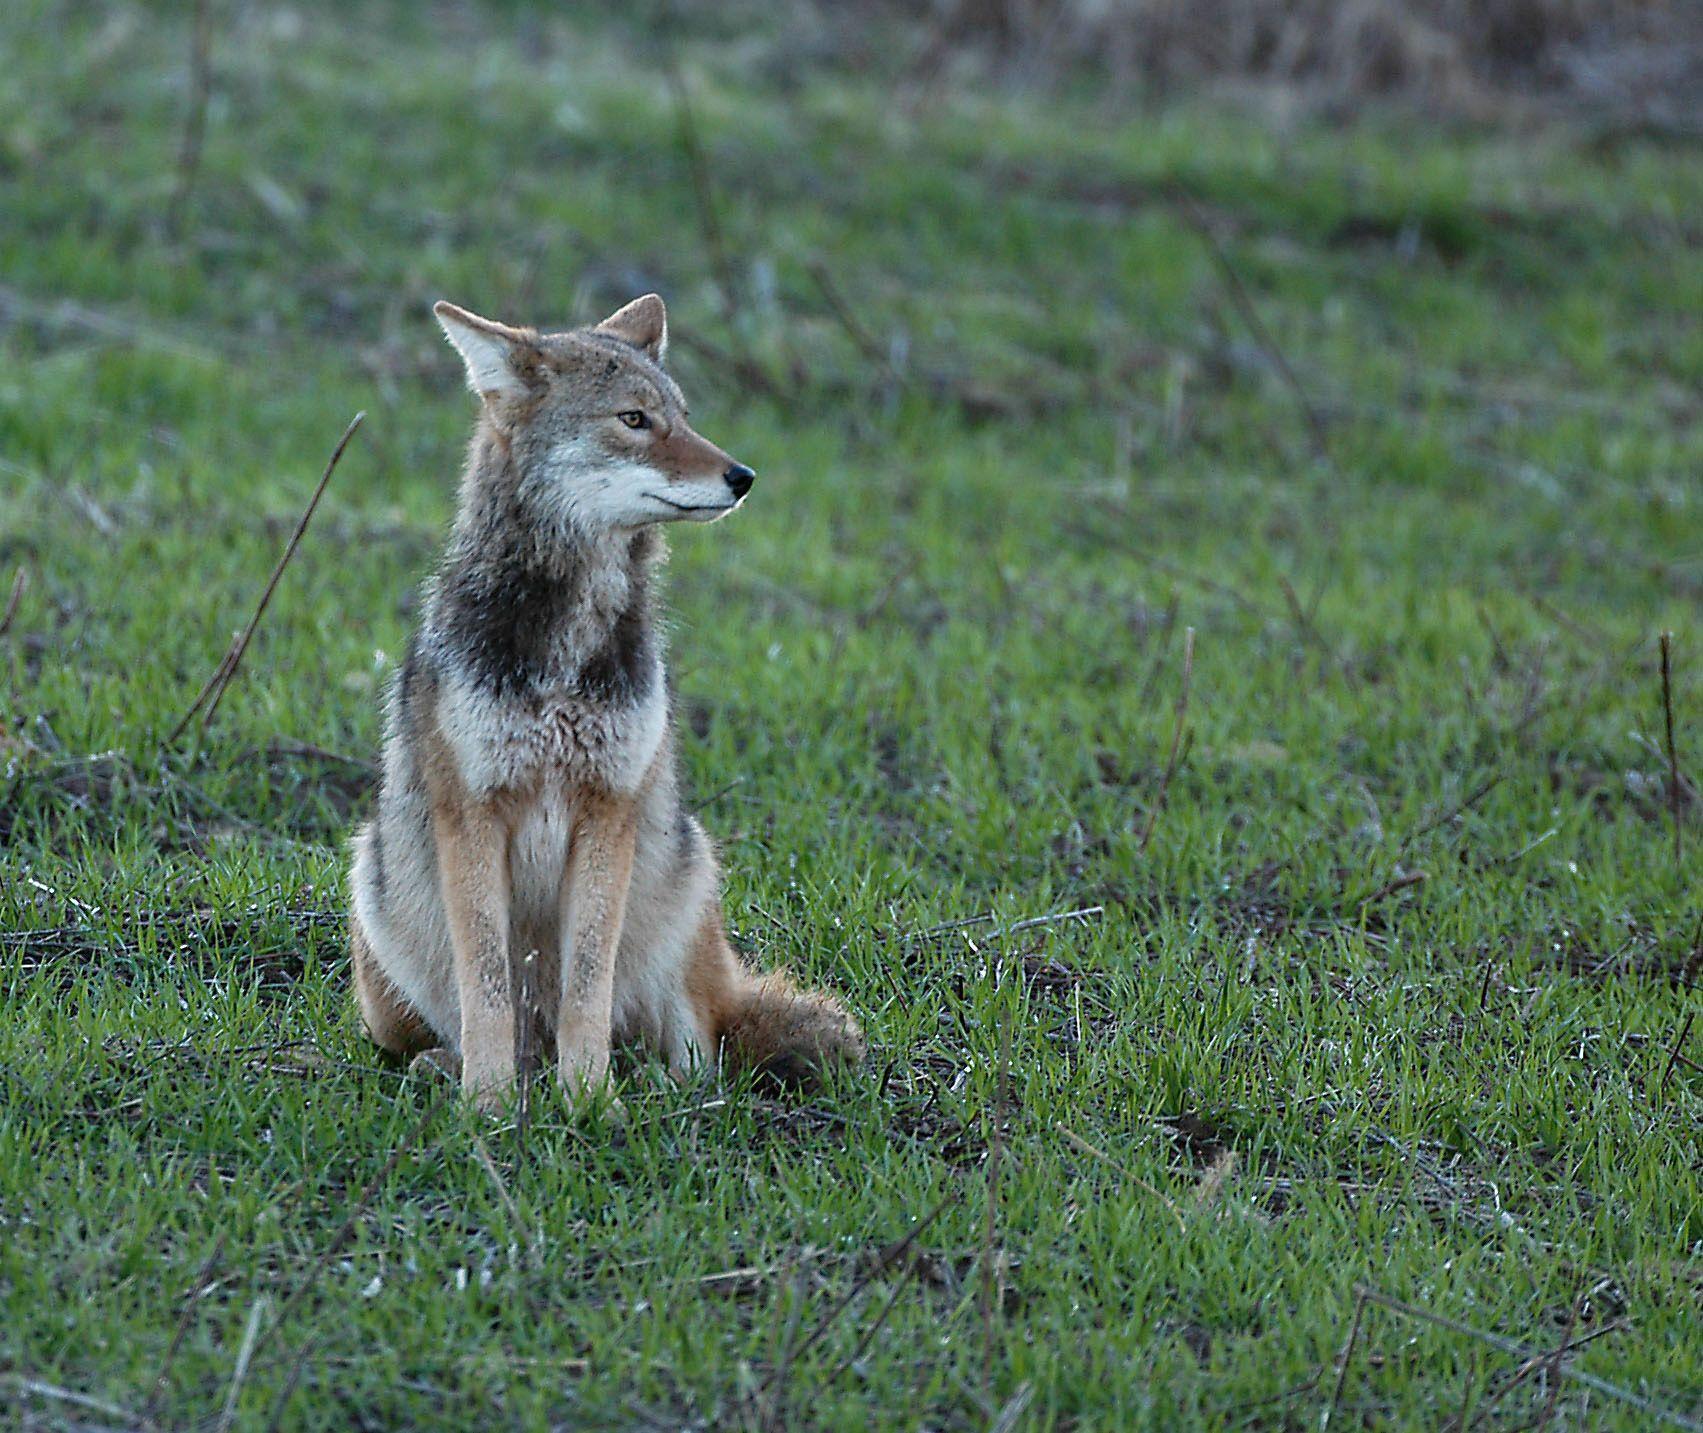 Ohio mammals: coyote